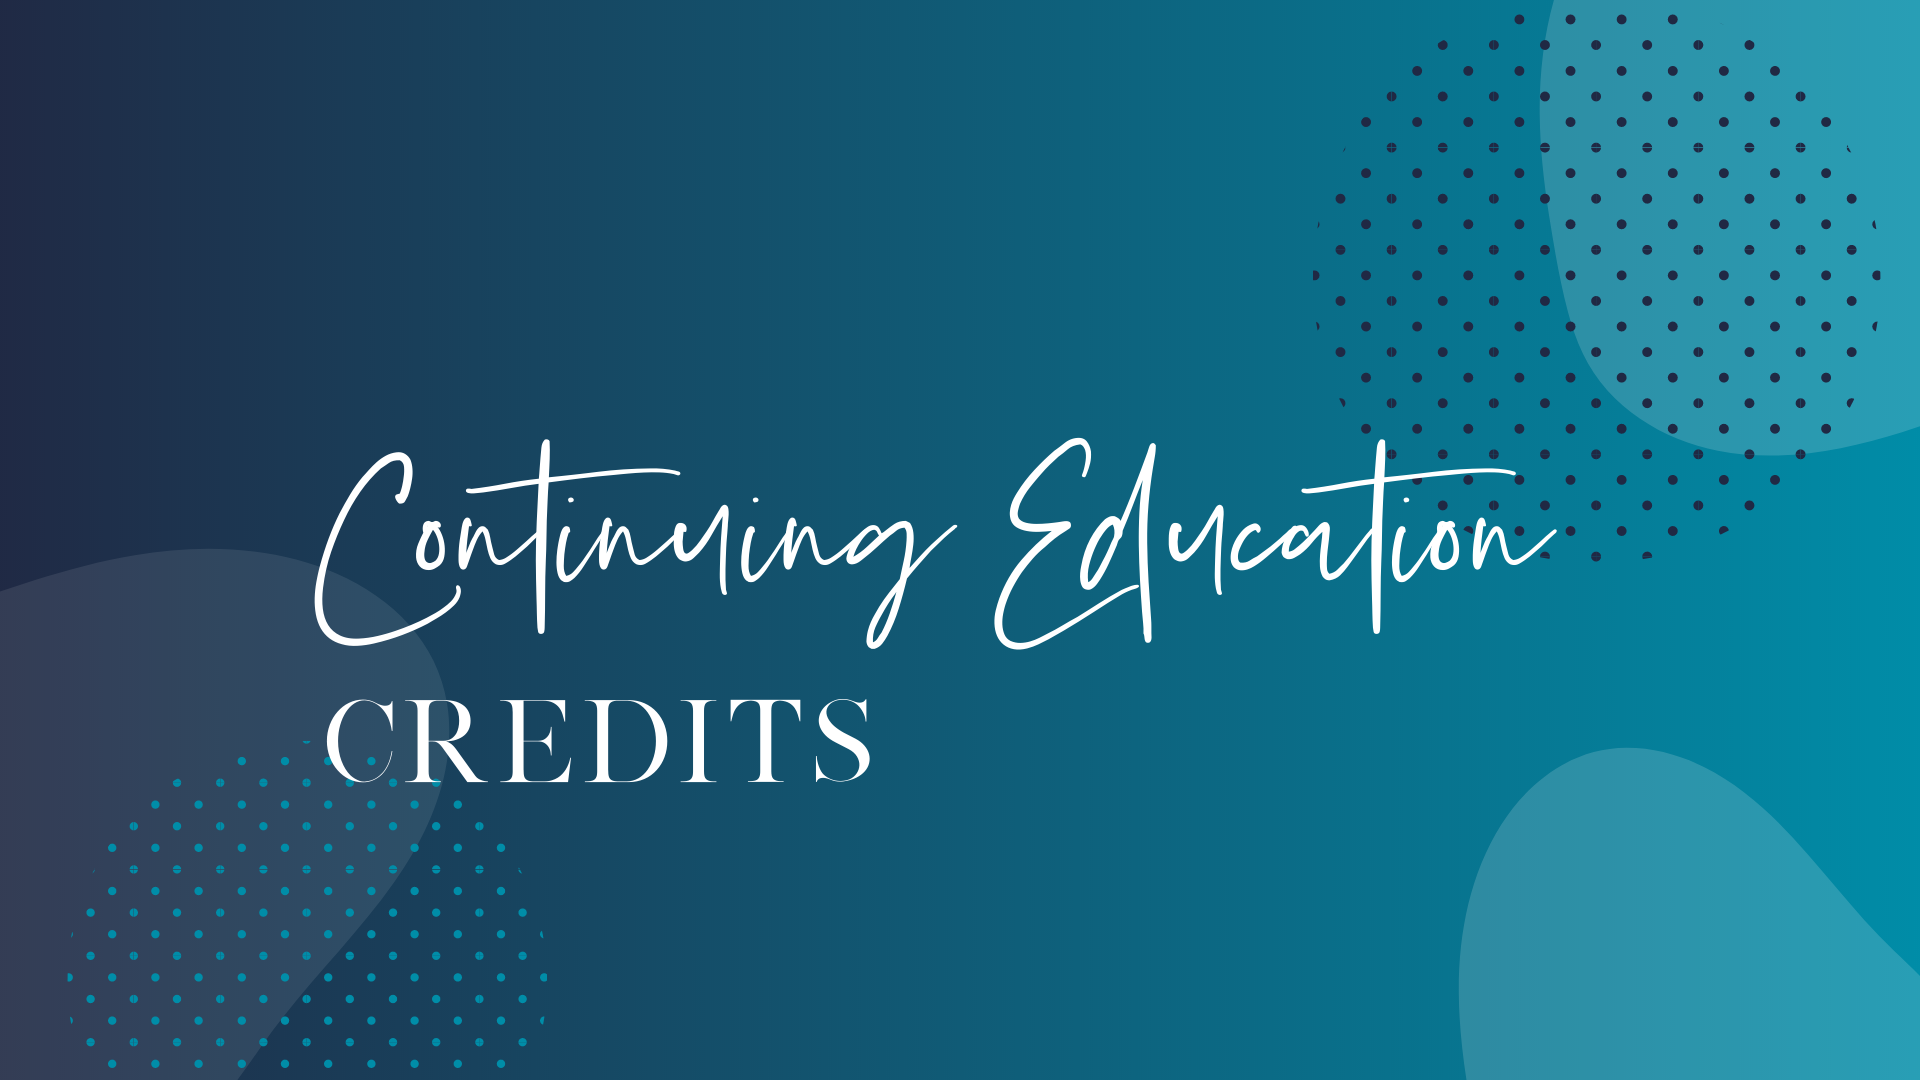 Continuing Education Credits